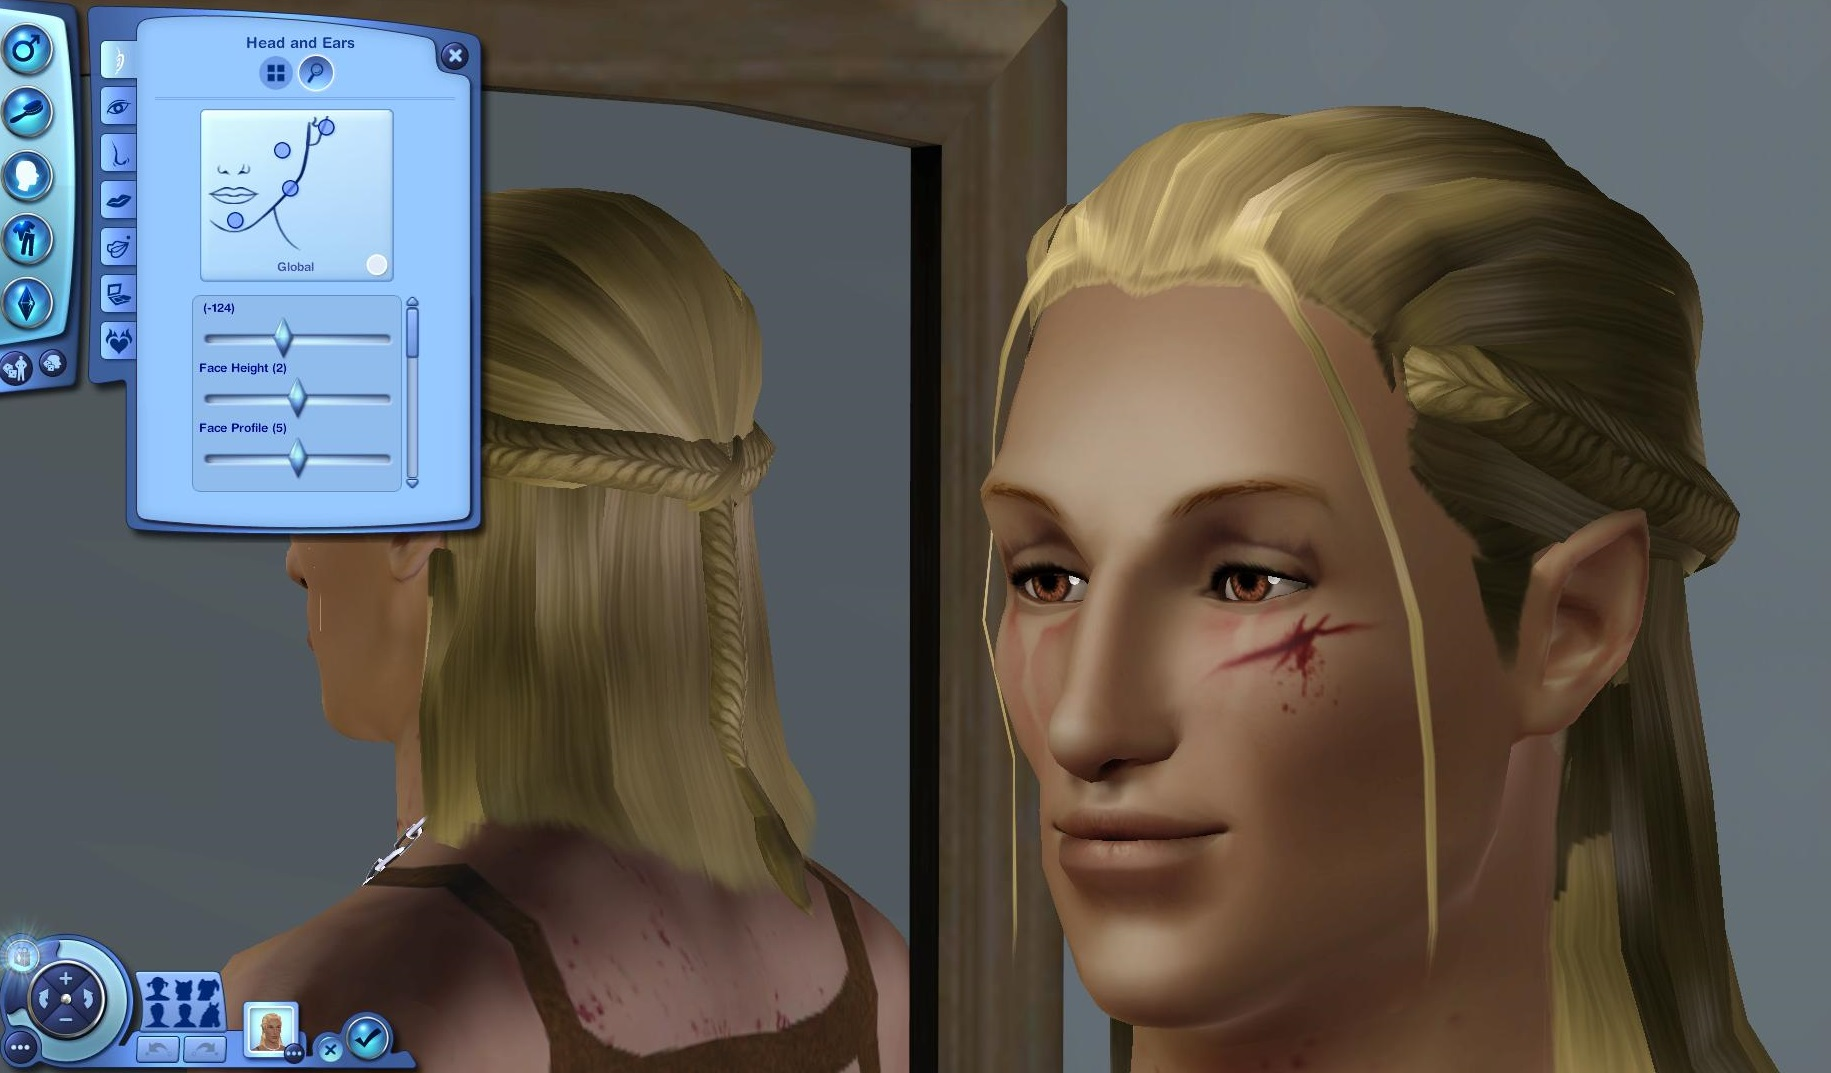 Sims 3 CAS Sliders   Mod Frenzy